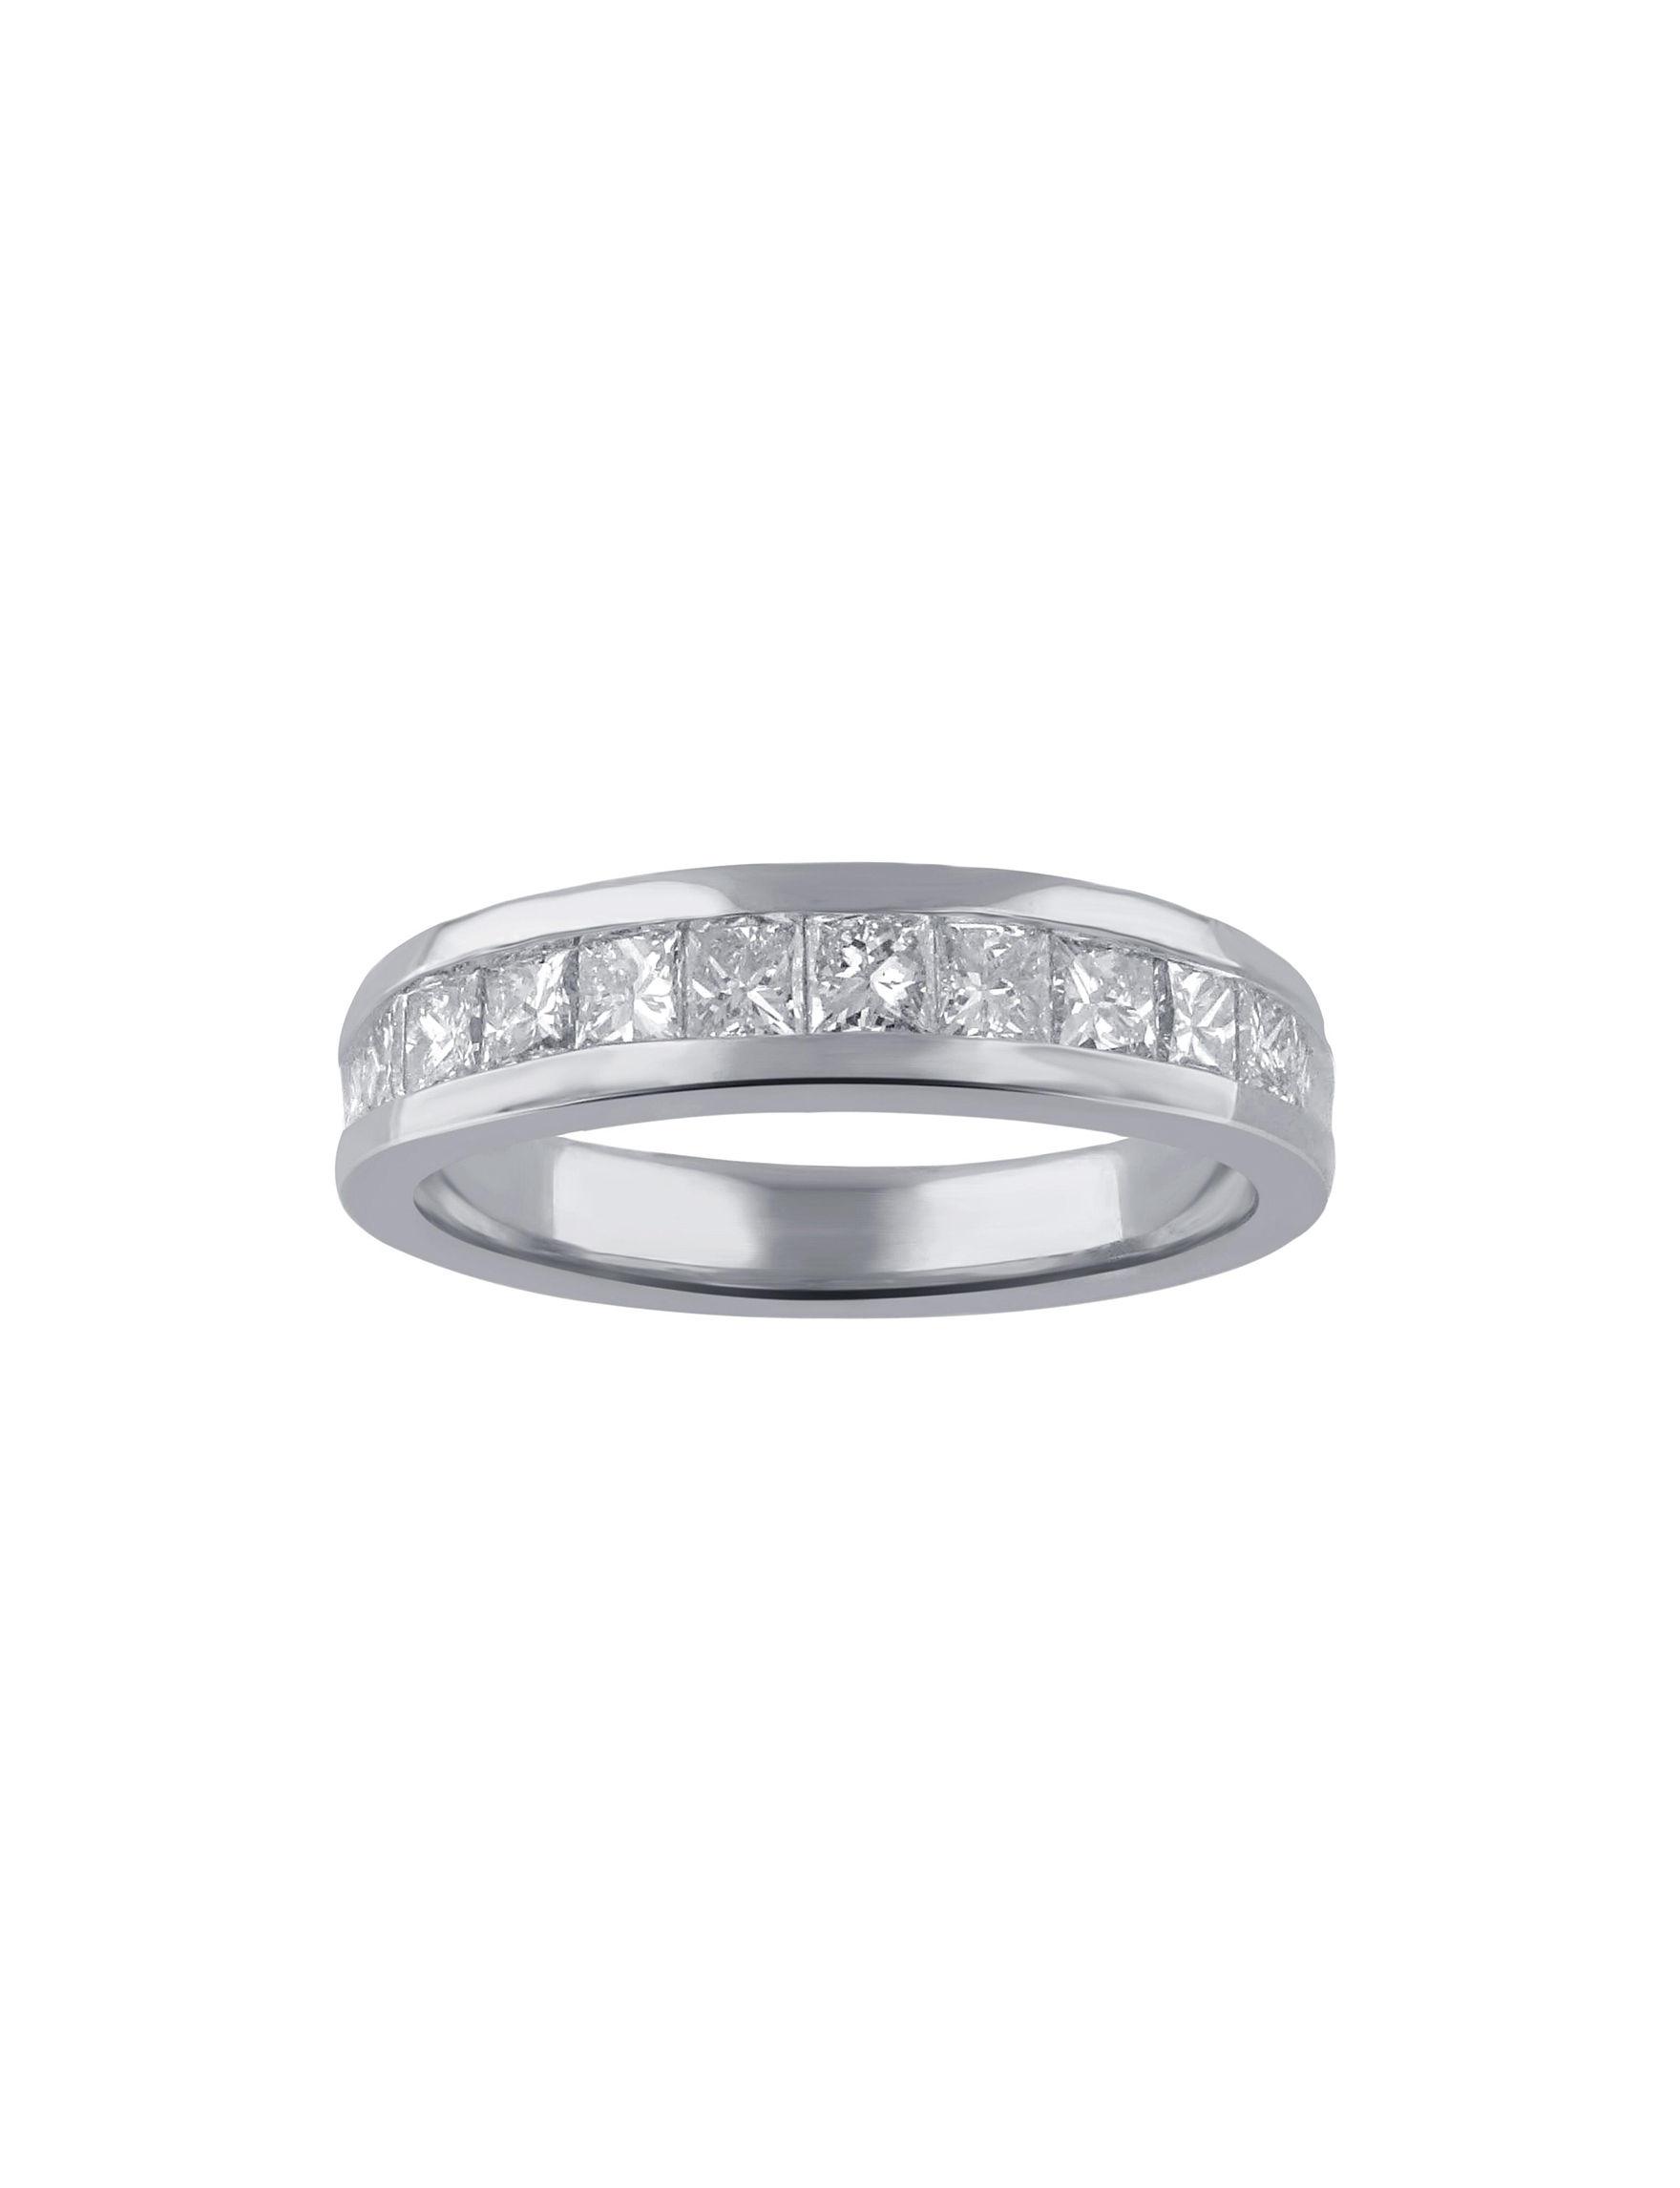 Kiran White Gold Rings Fine Jewelry